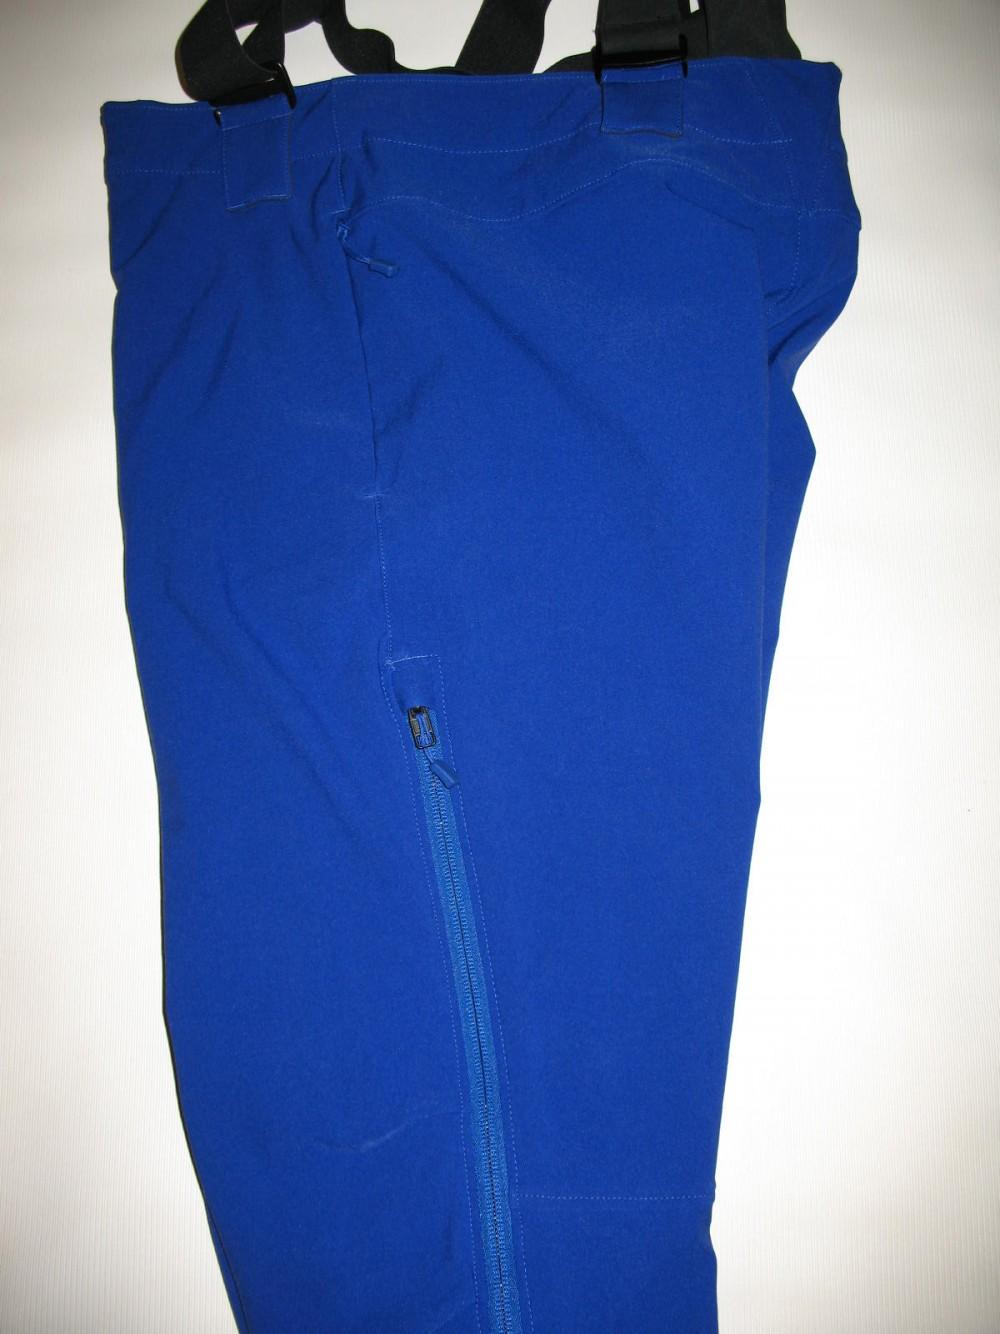 Штаны BLACK DIAMOND dawn patrol touring pants lady (размер S) - 6